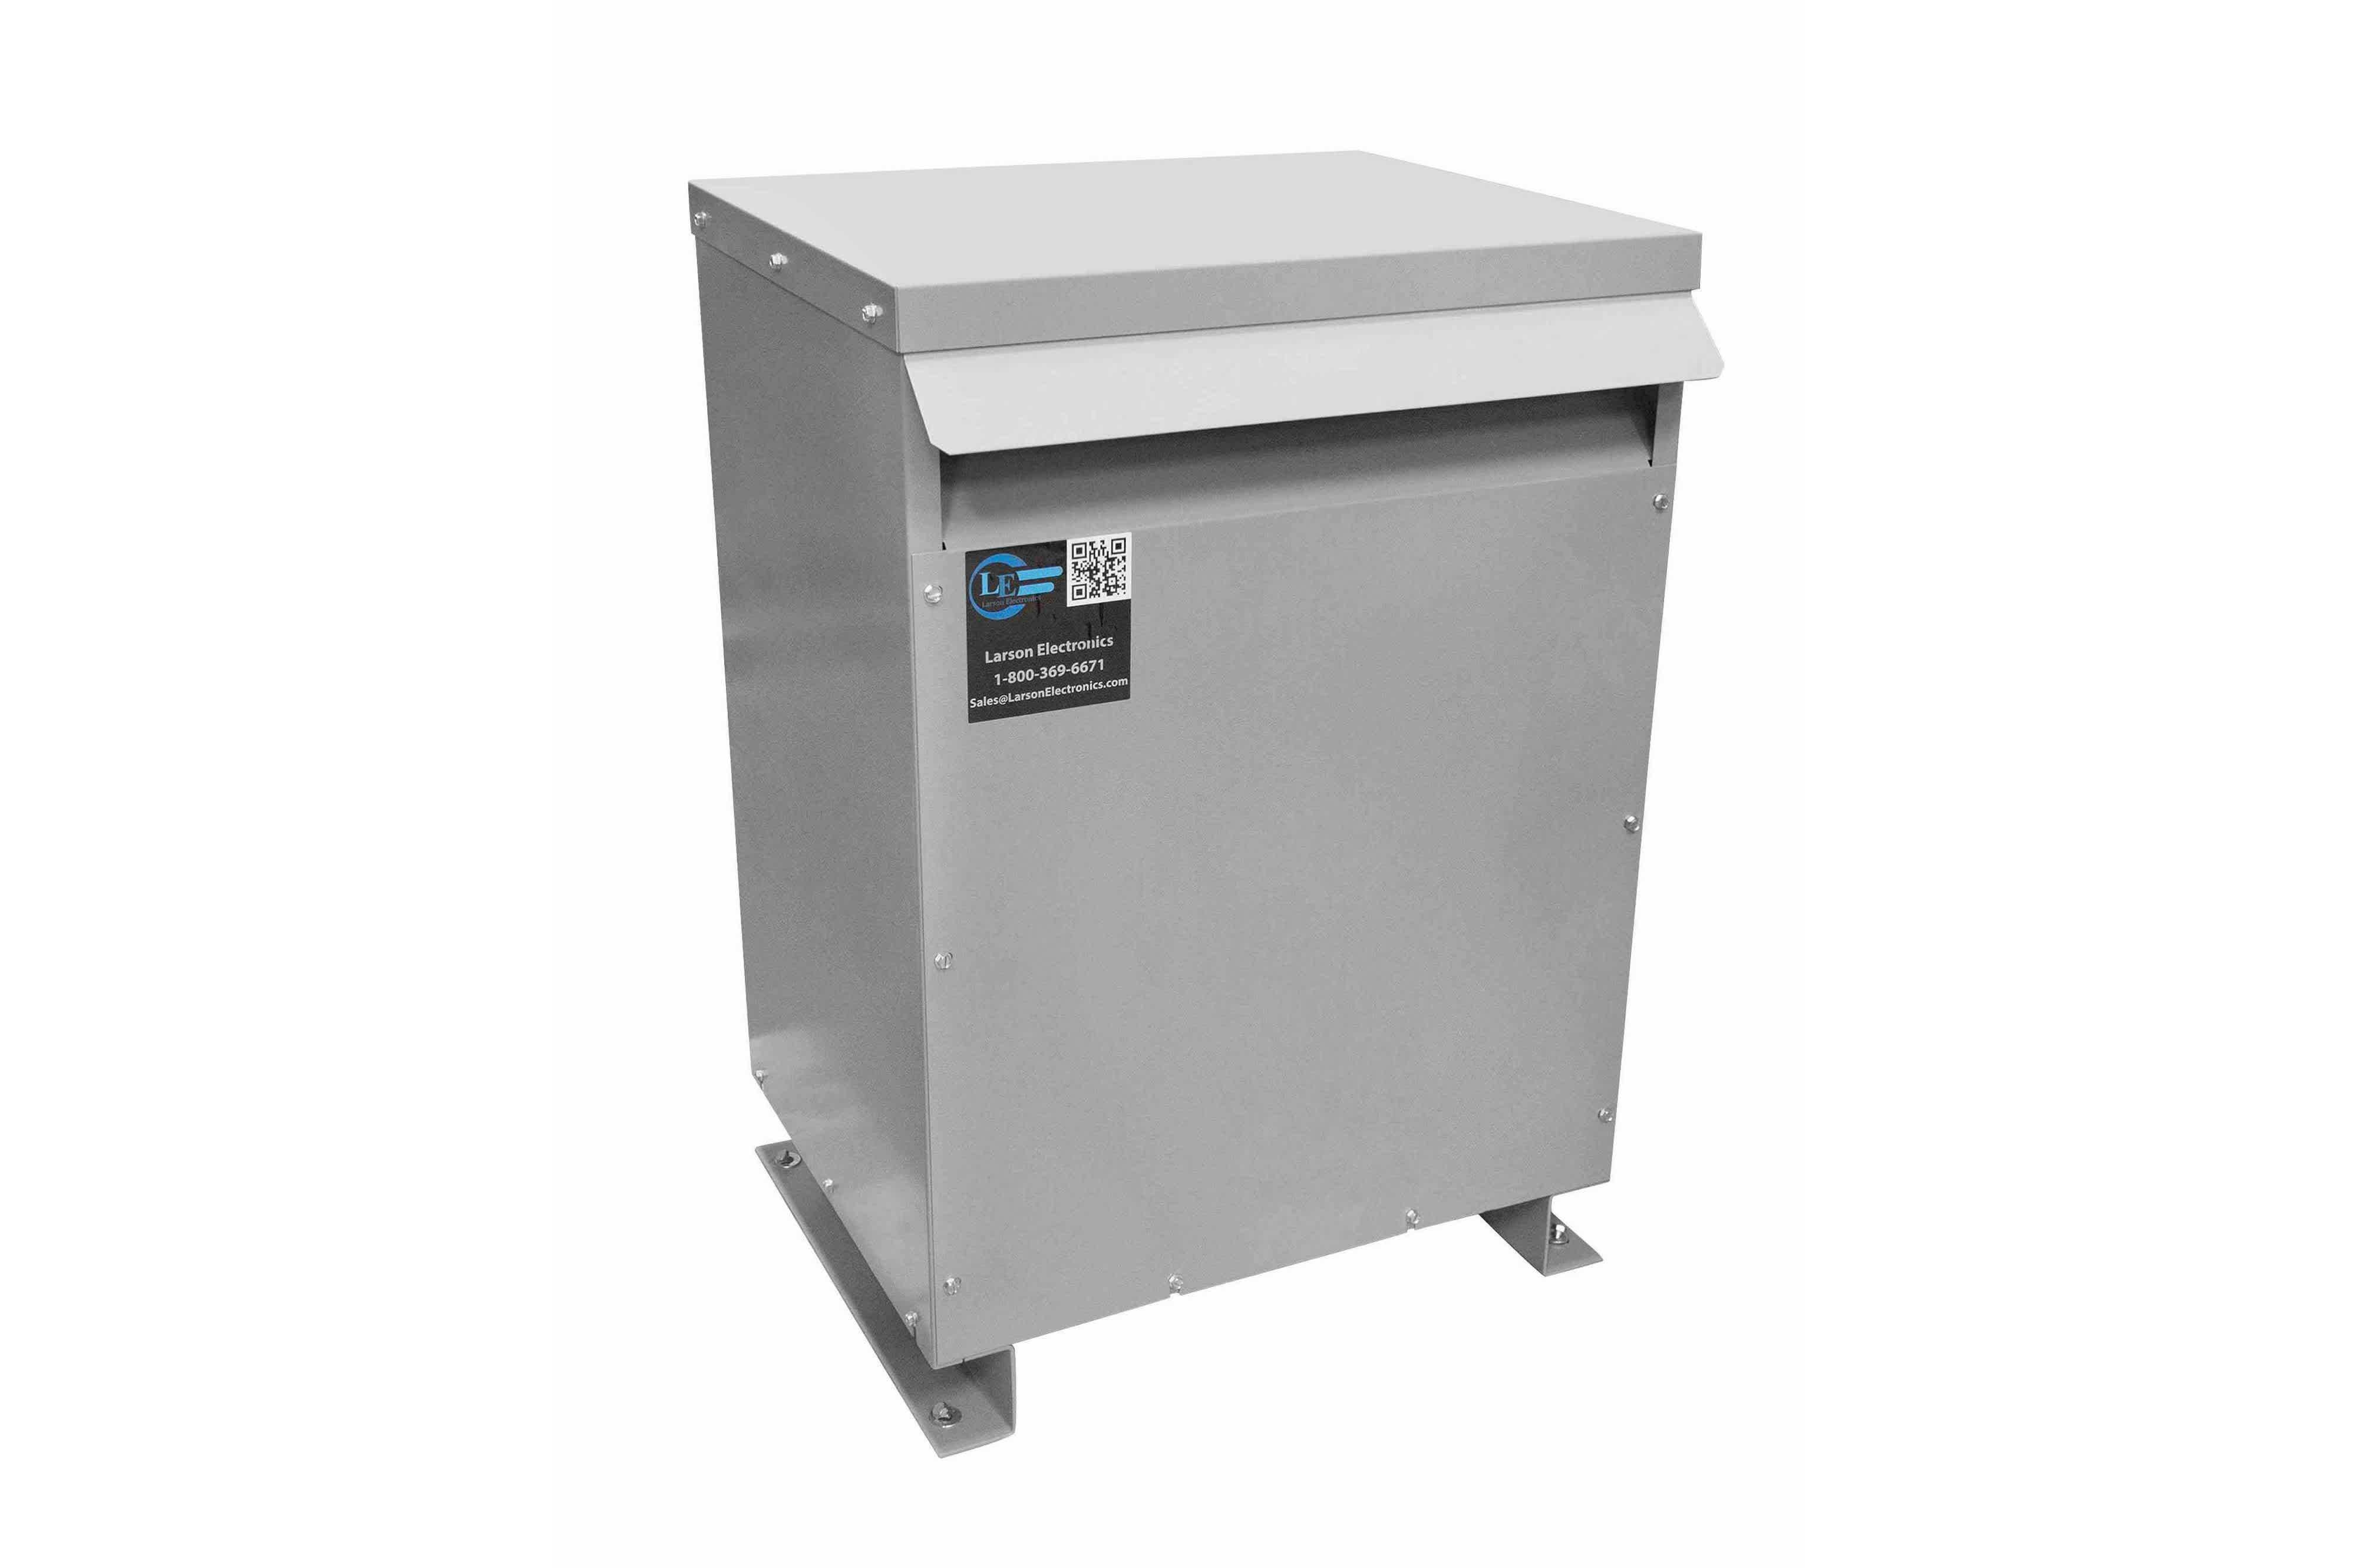 112.5 kVA 3PH Isolation Transformer, 600V Wye Primary, 380V Delta Secondary, N3R, Ventilated, 60 Hz